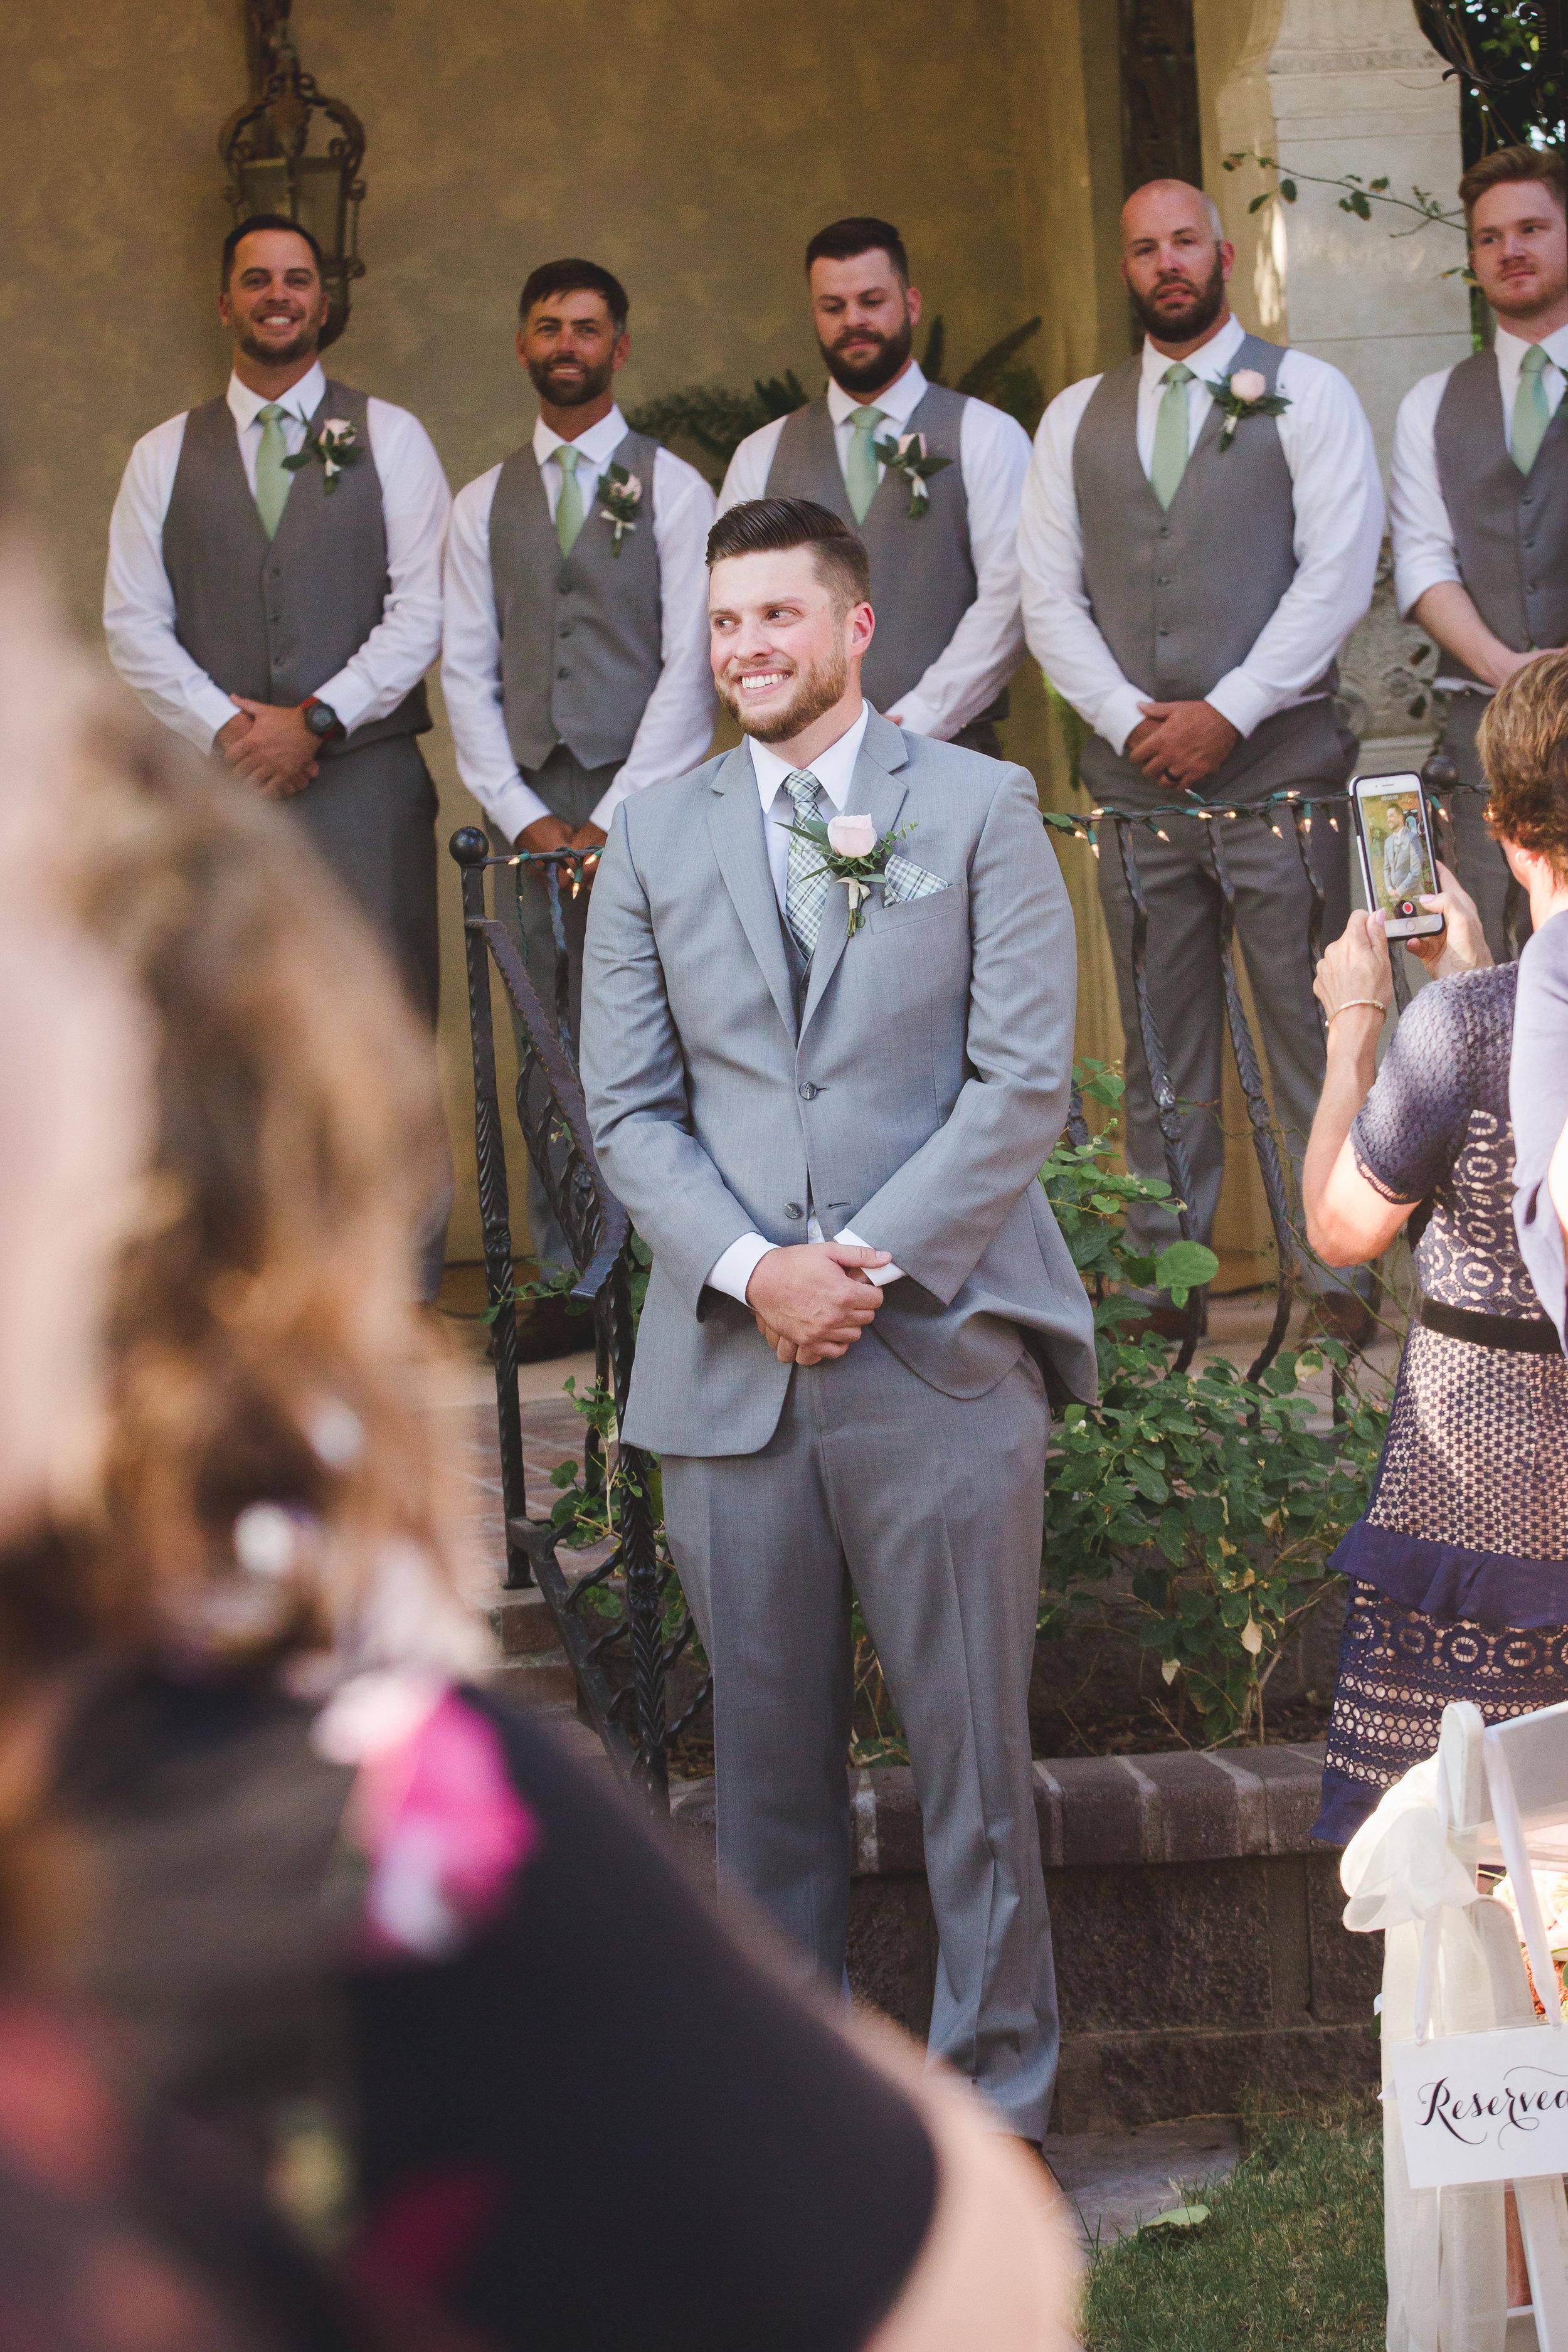 2018-09-07-WEDDING-MCBRIDE-TERRY-162.jpg